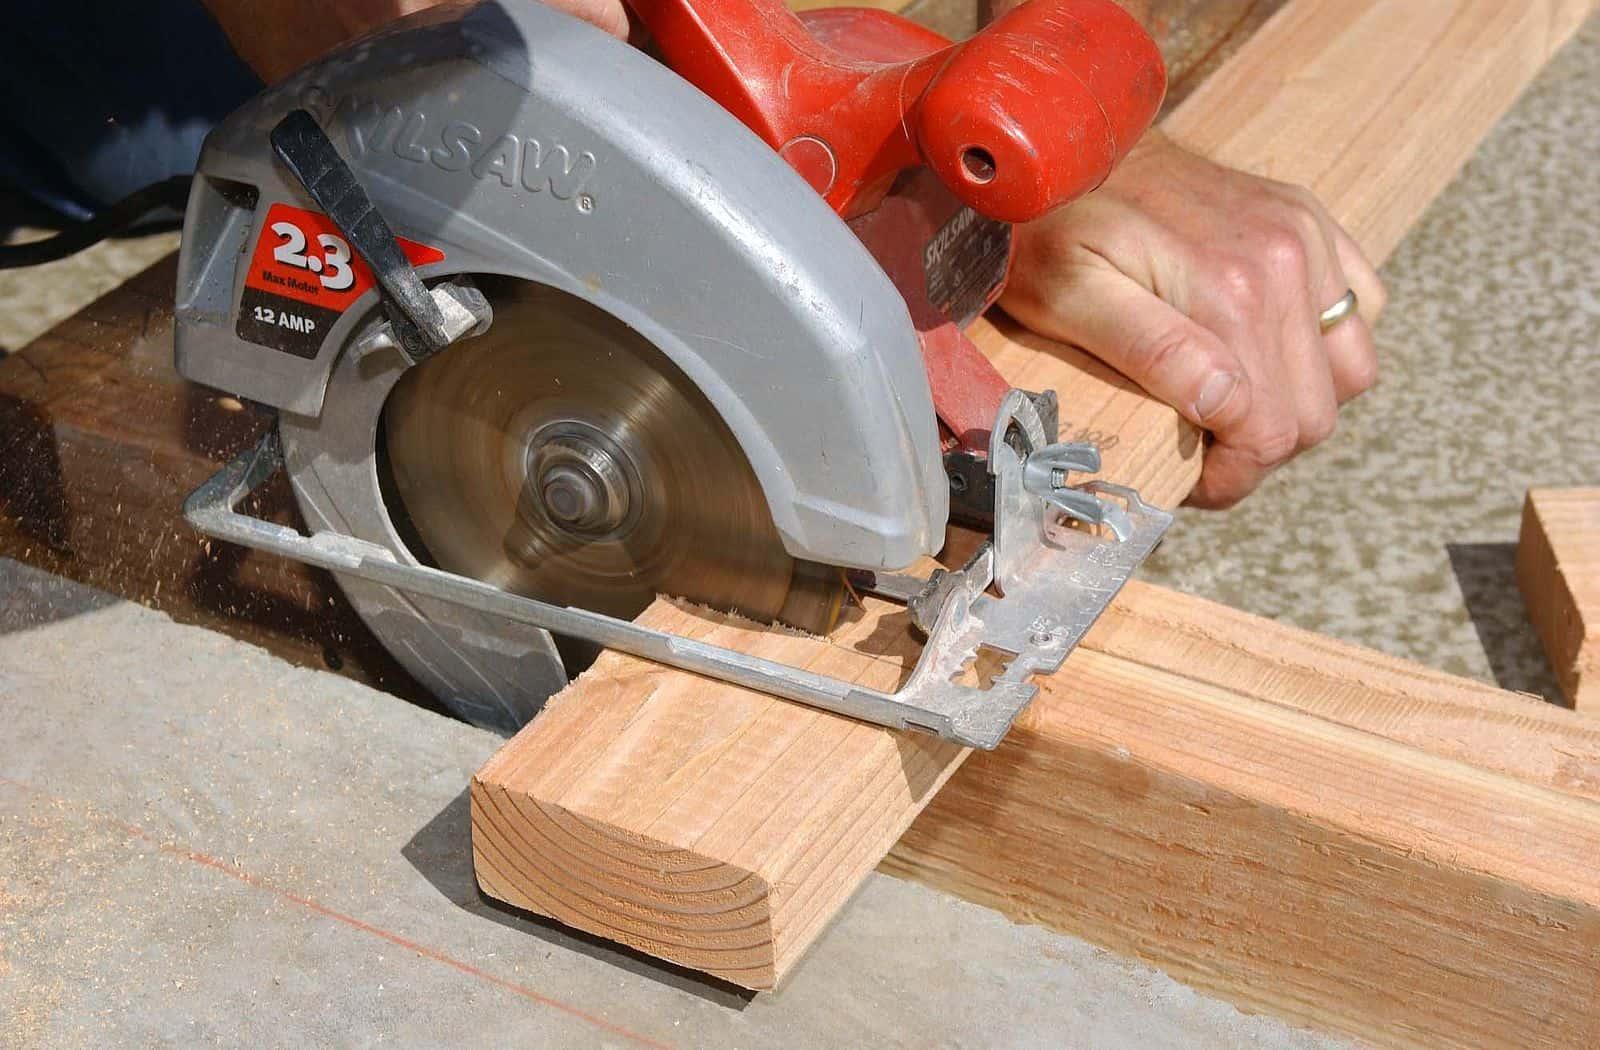 A hand-held circular saw